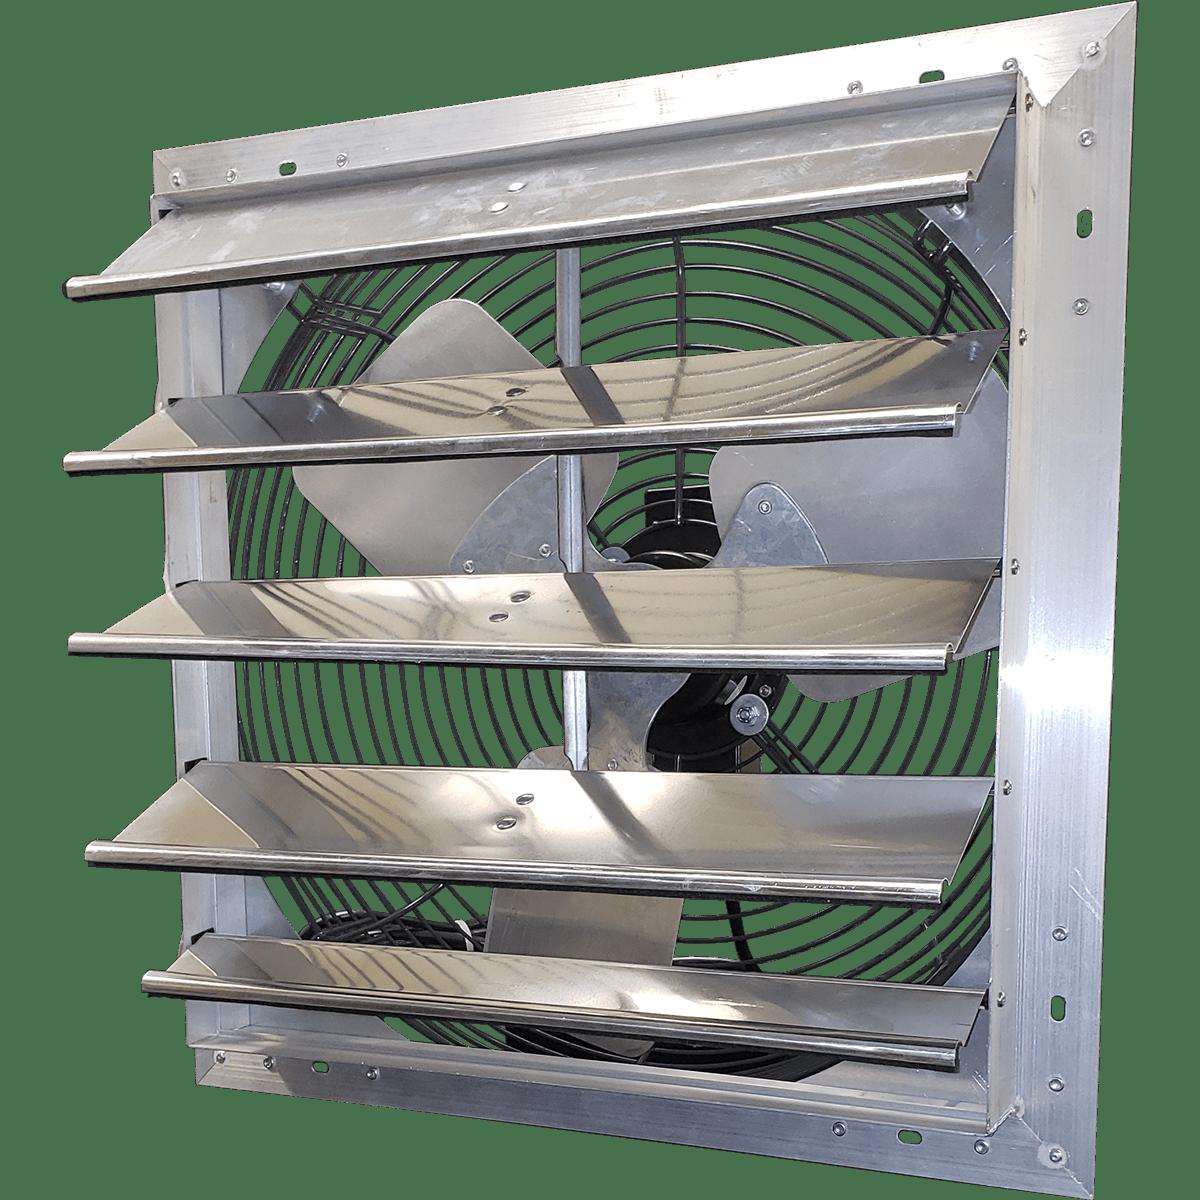 All Guard Shutters hessaire 20 inch shutter mounted exhaust fan